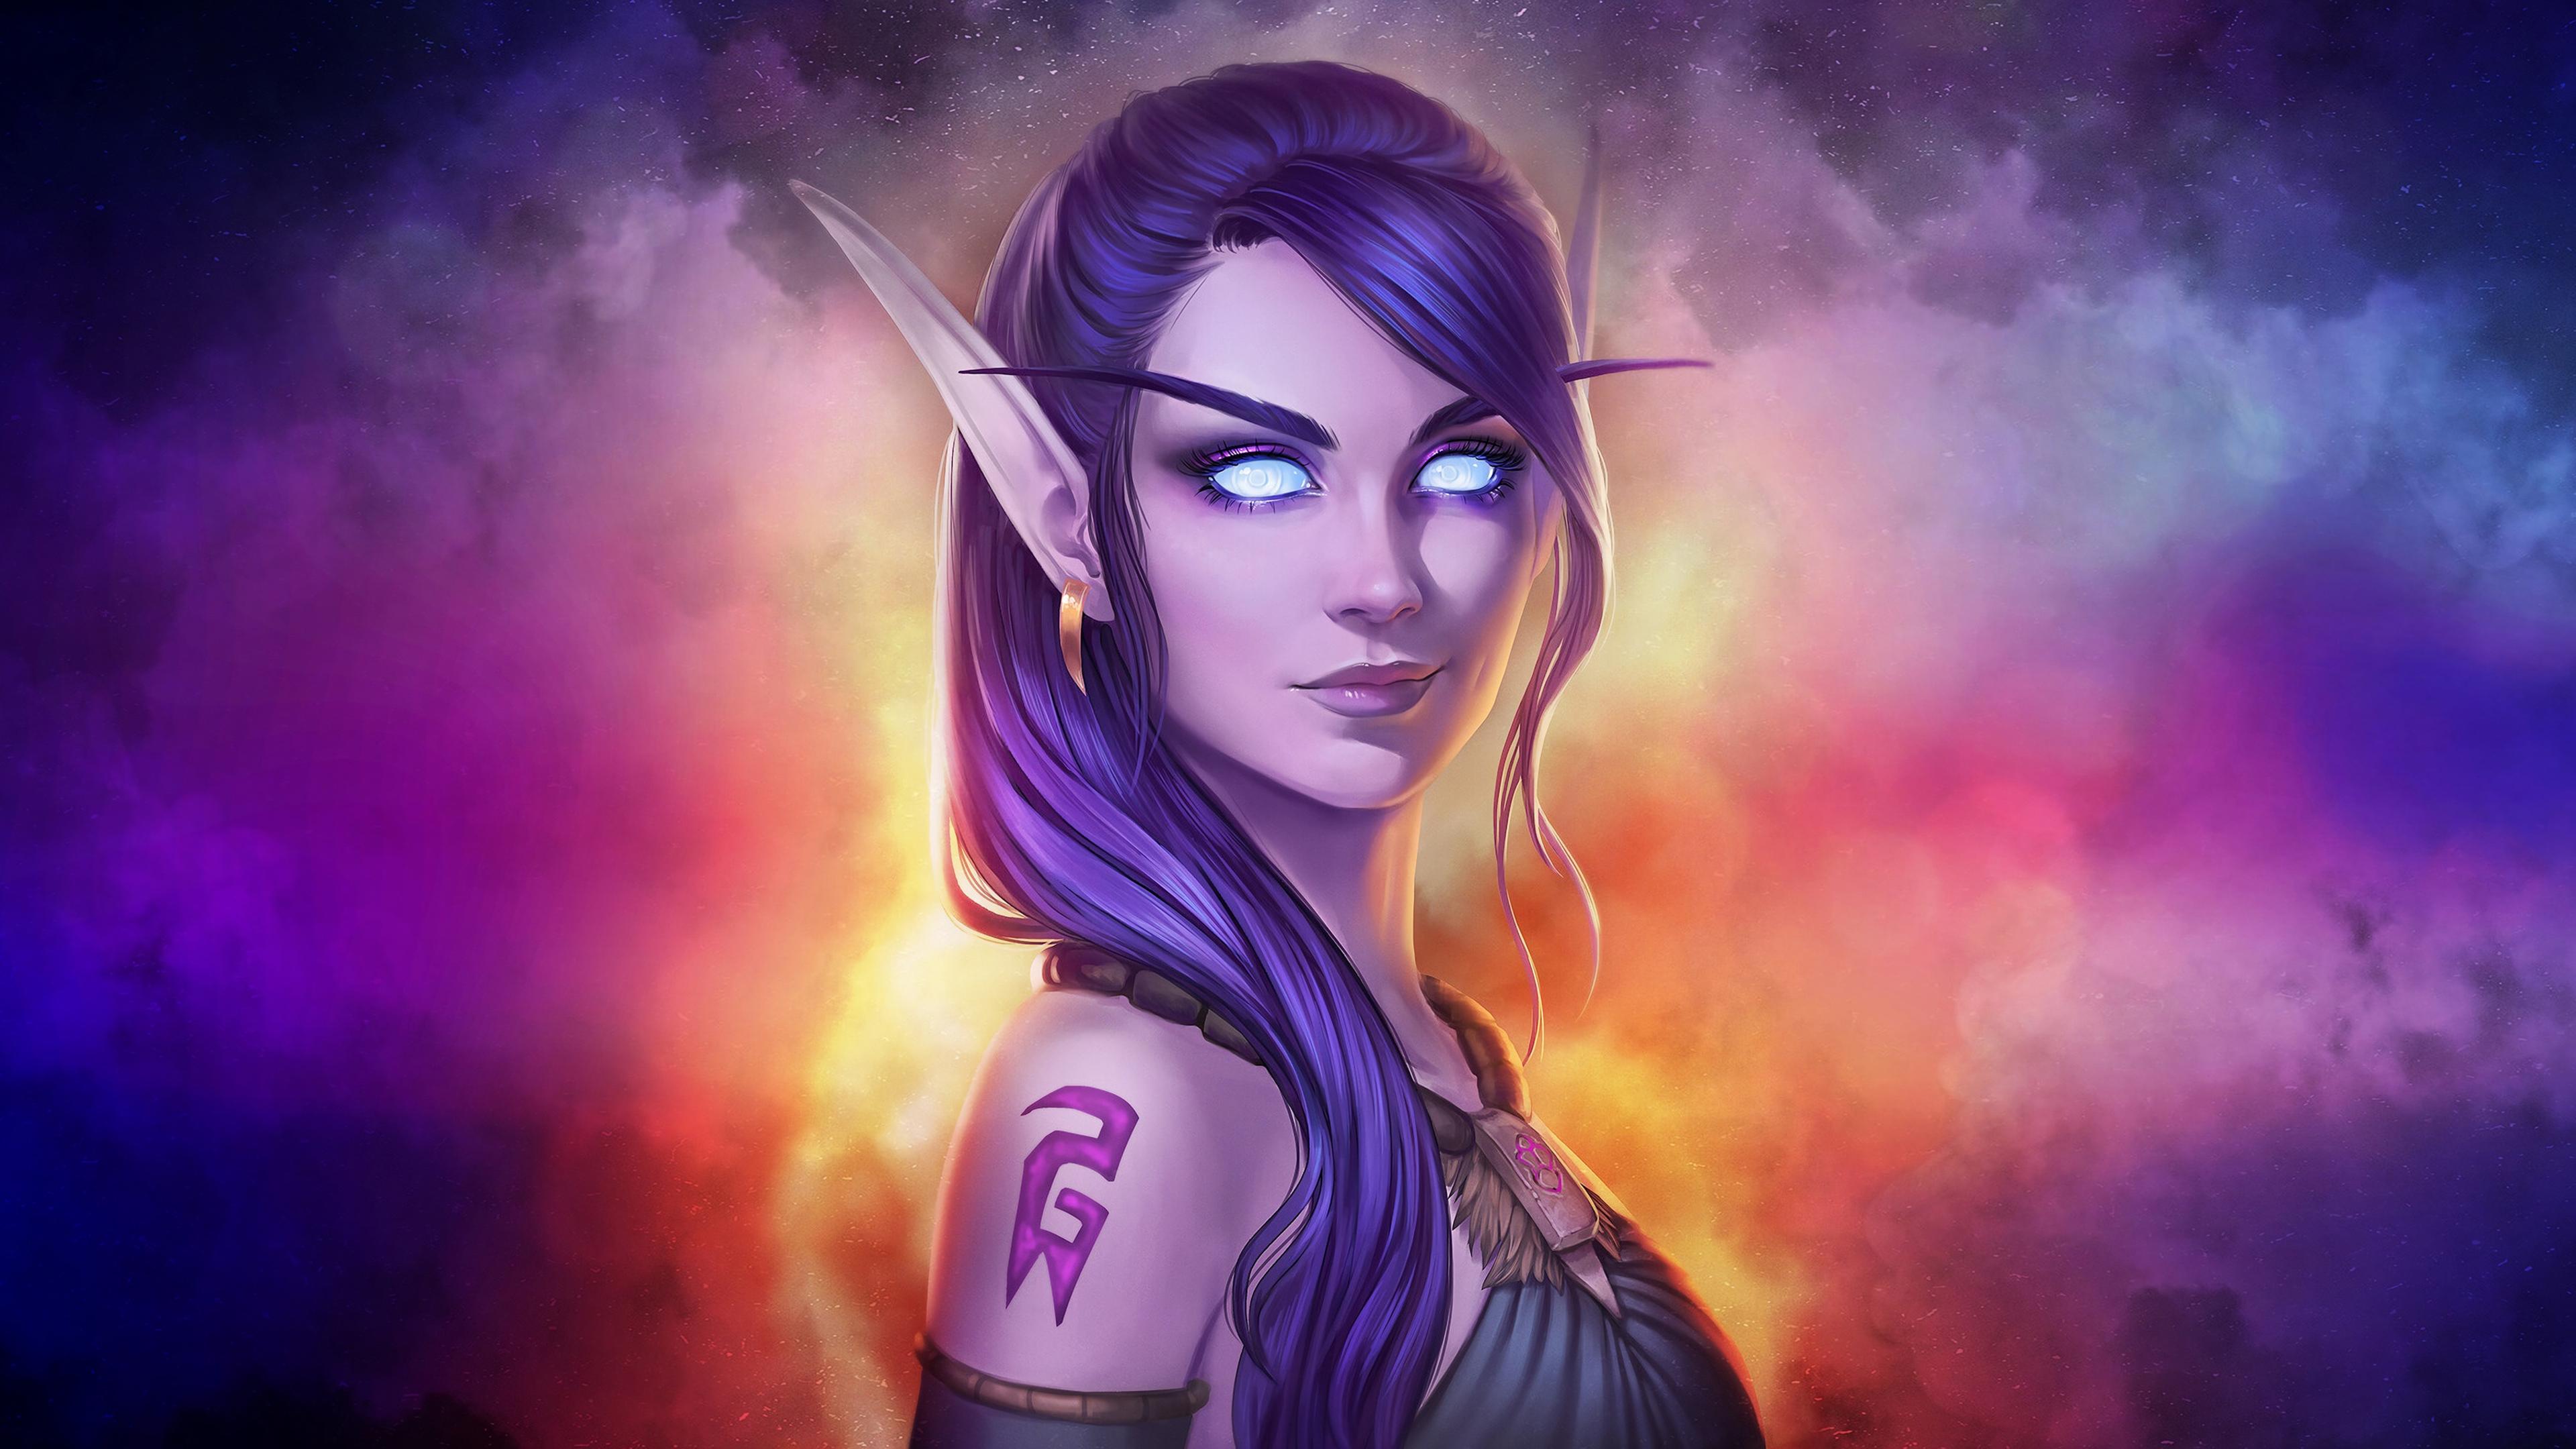 world of warcraft fantasy girl art 1570392322 - World Of Warcraft Fantasy Girl Art - world of warcraft wallpapers, hd-wallpapers, games wallpapers, 4k-wallpapers